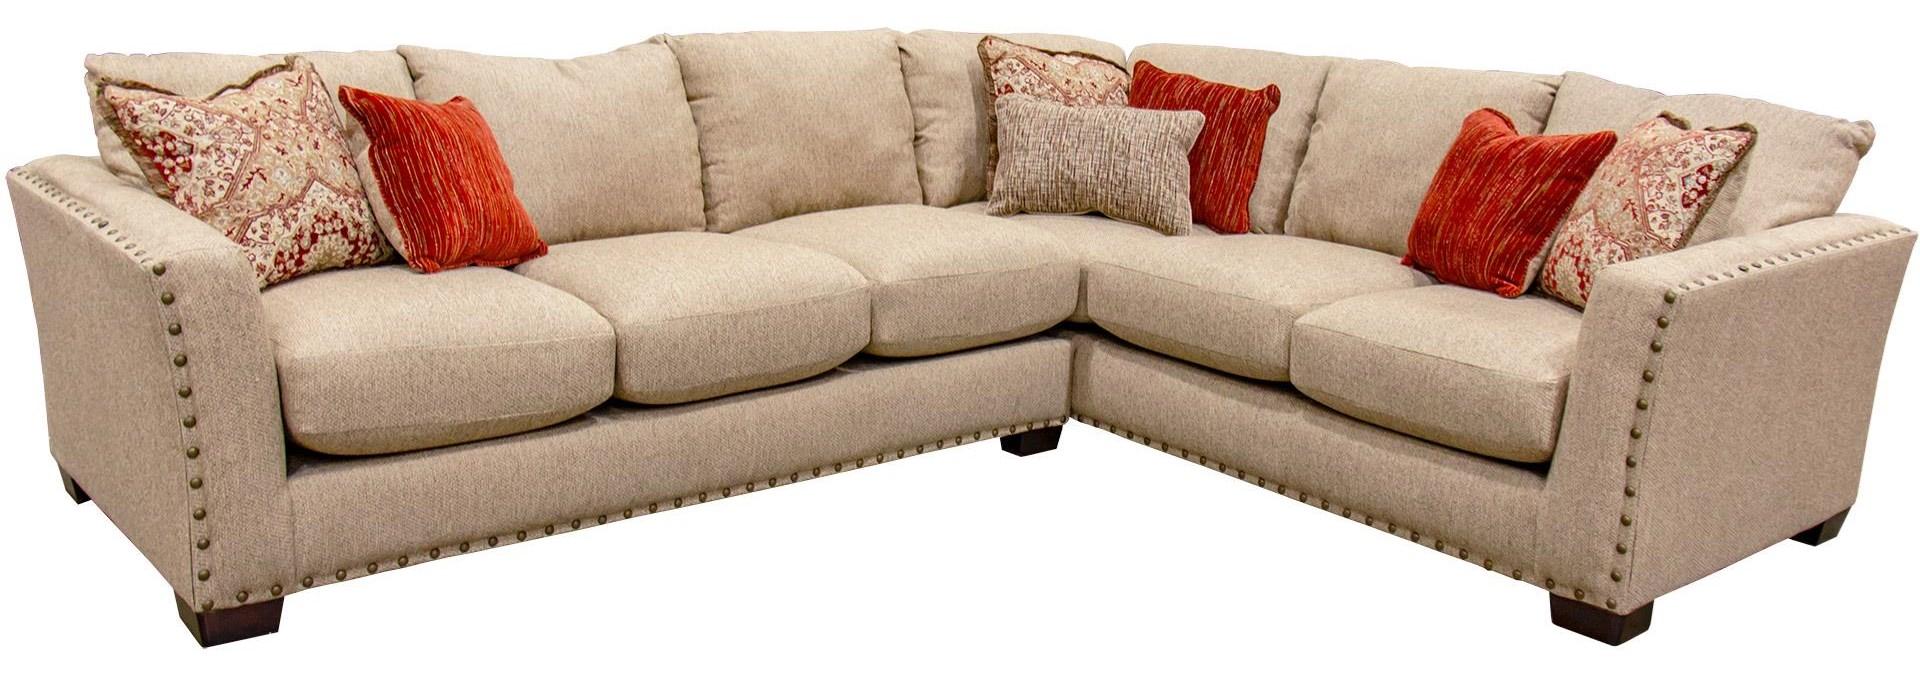 2 Piece Sectional Sofa with Nailhead Trim